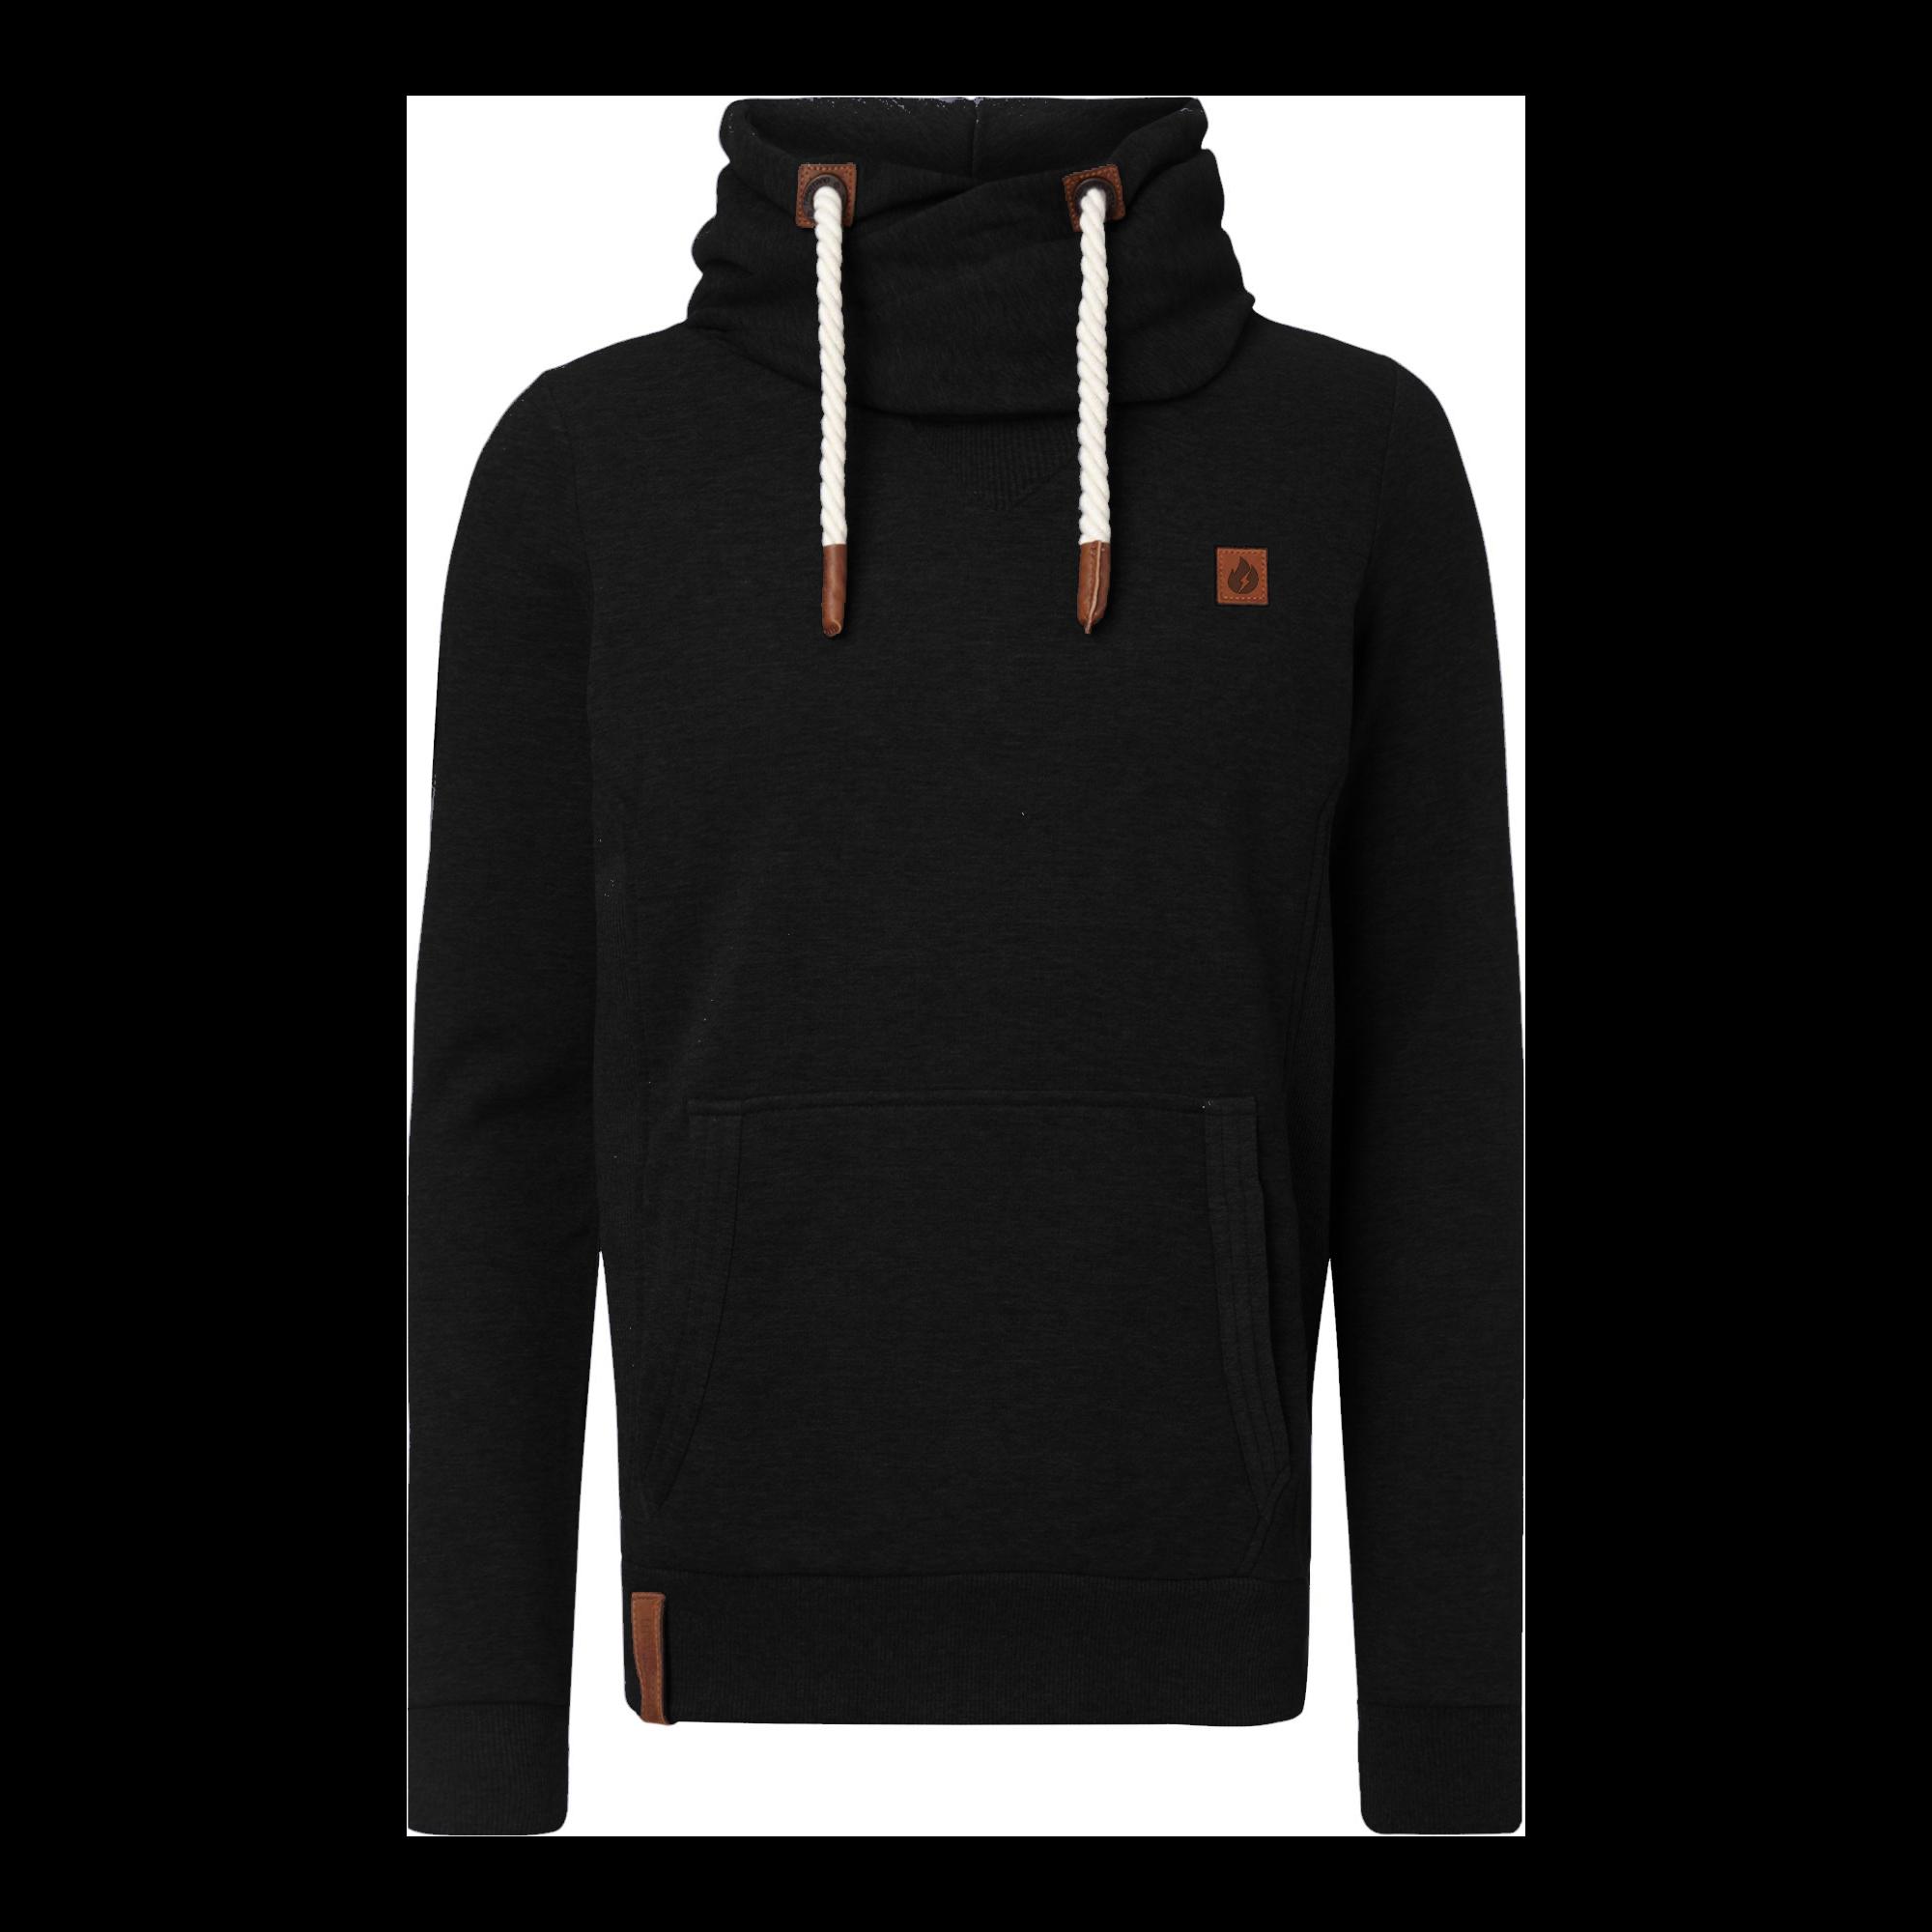 The original livewarm heated. Hoodie clipart hooded sweatshirt